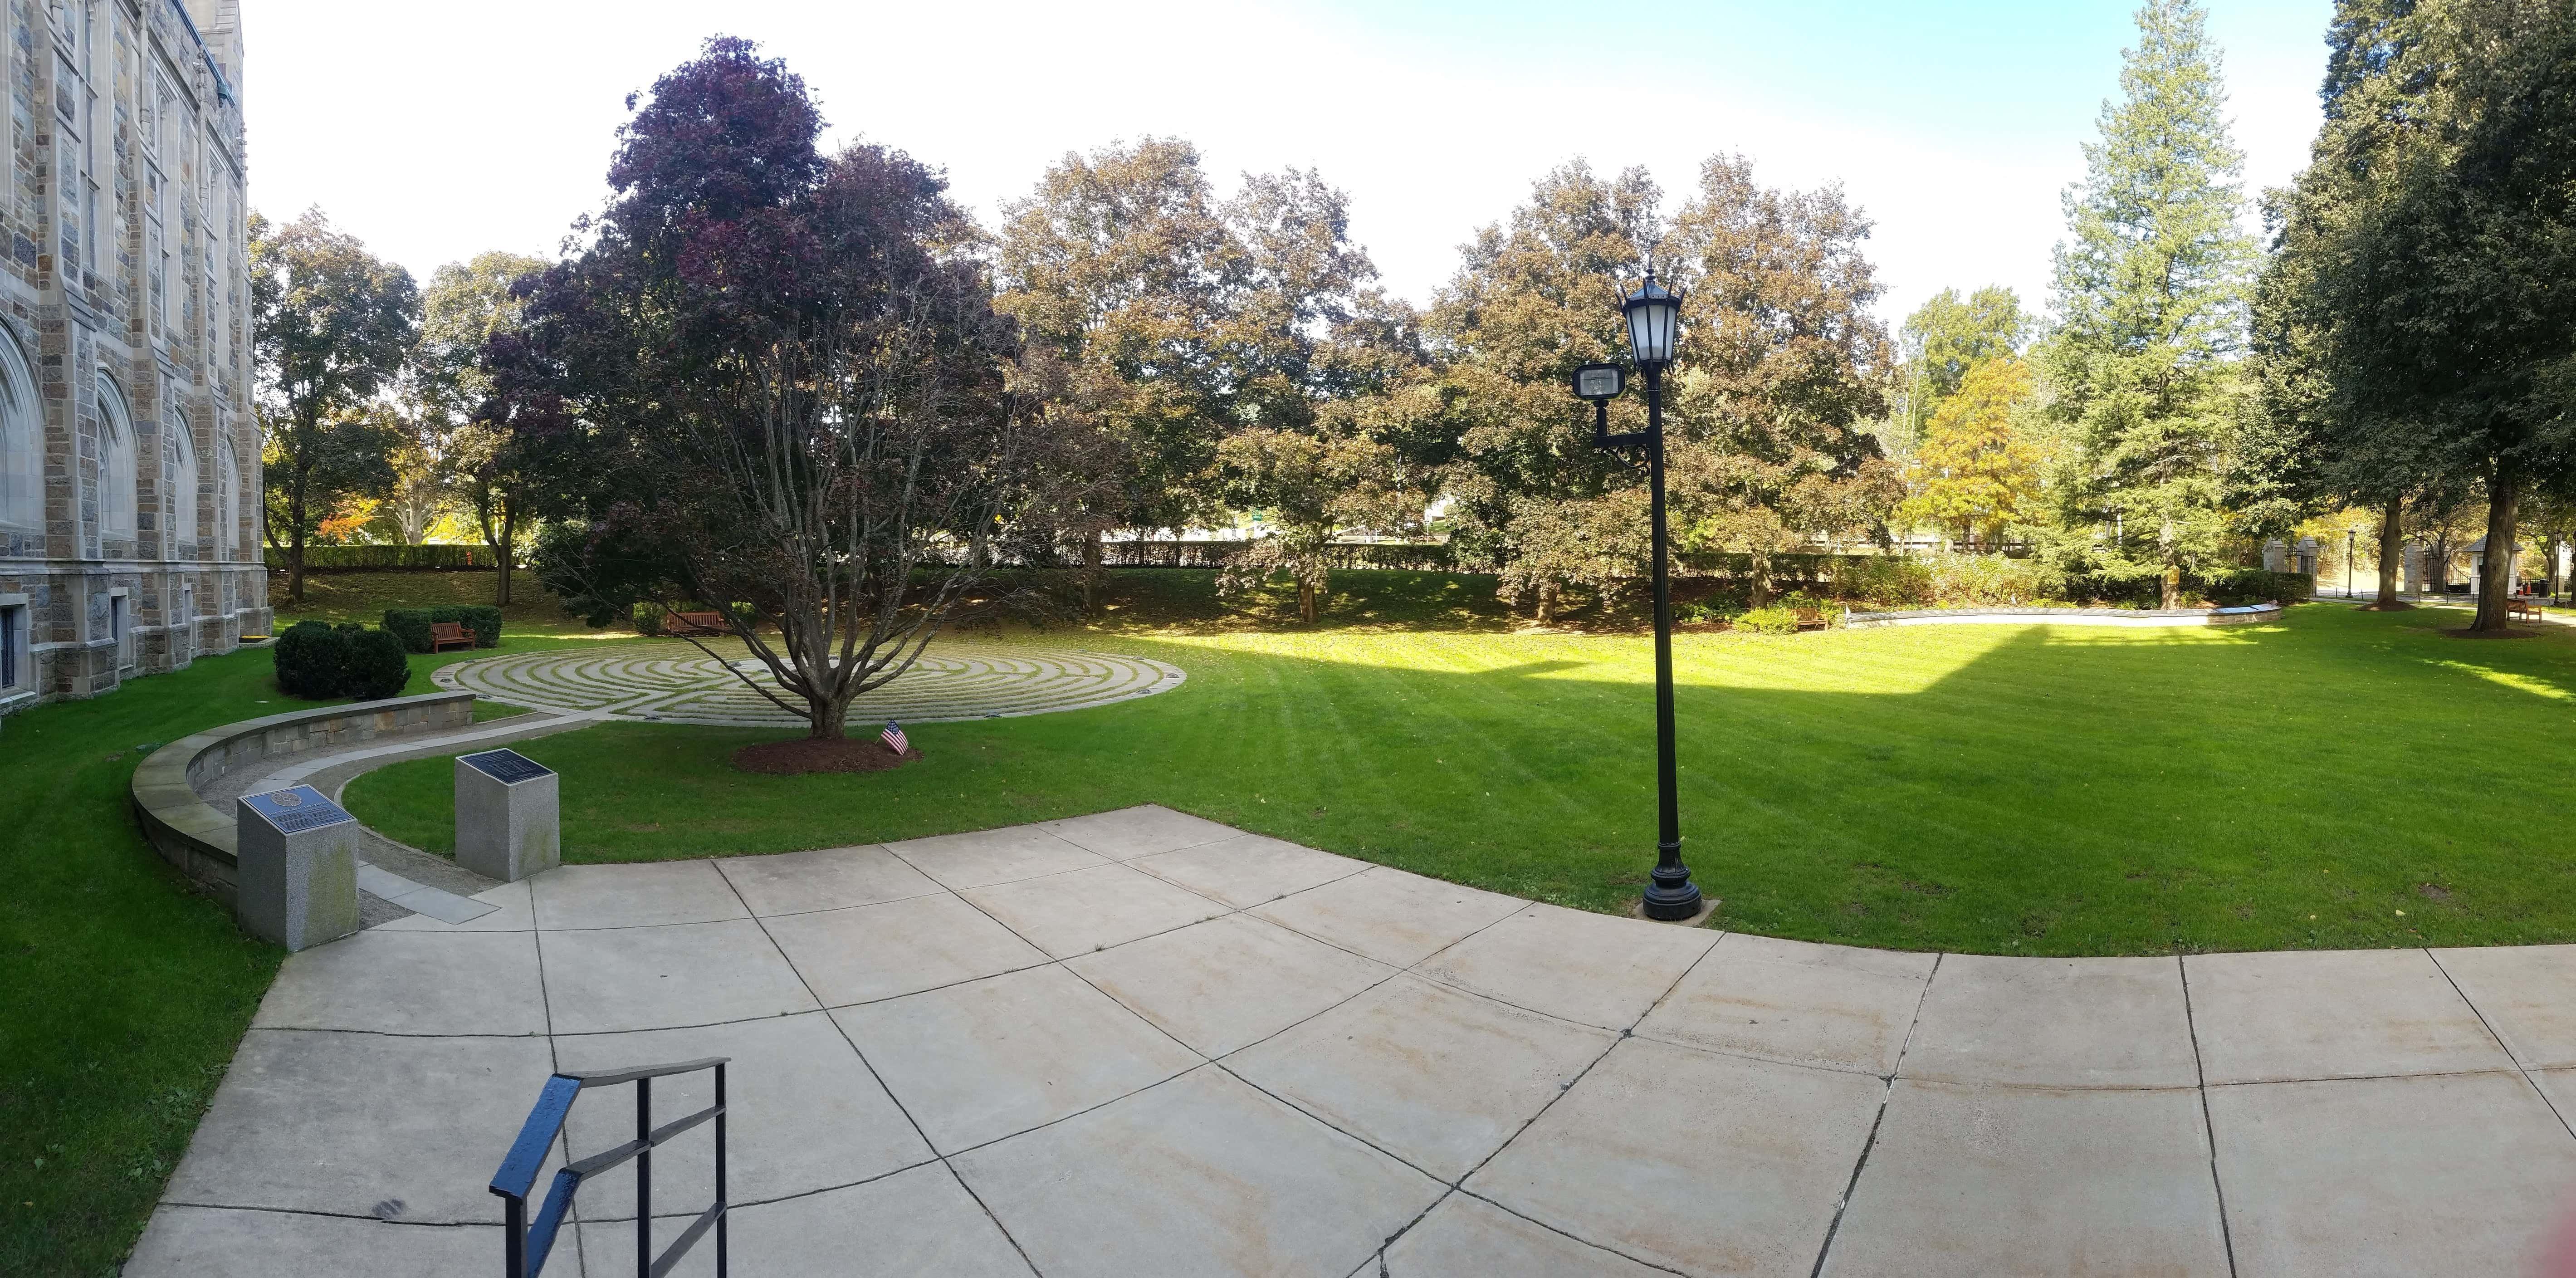 A panorama of the 9/11 Memorial Labyrinth and Veterans Memorial